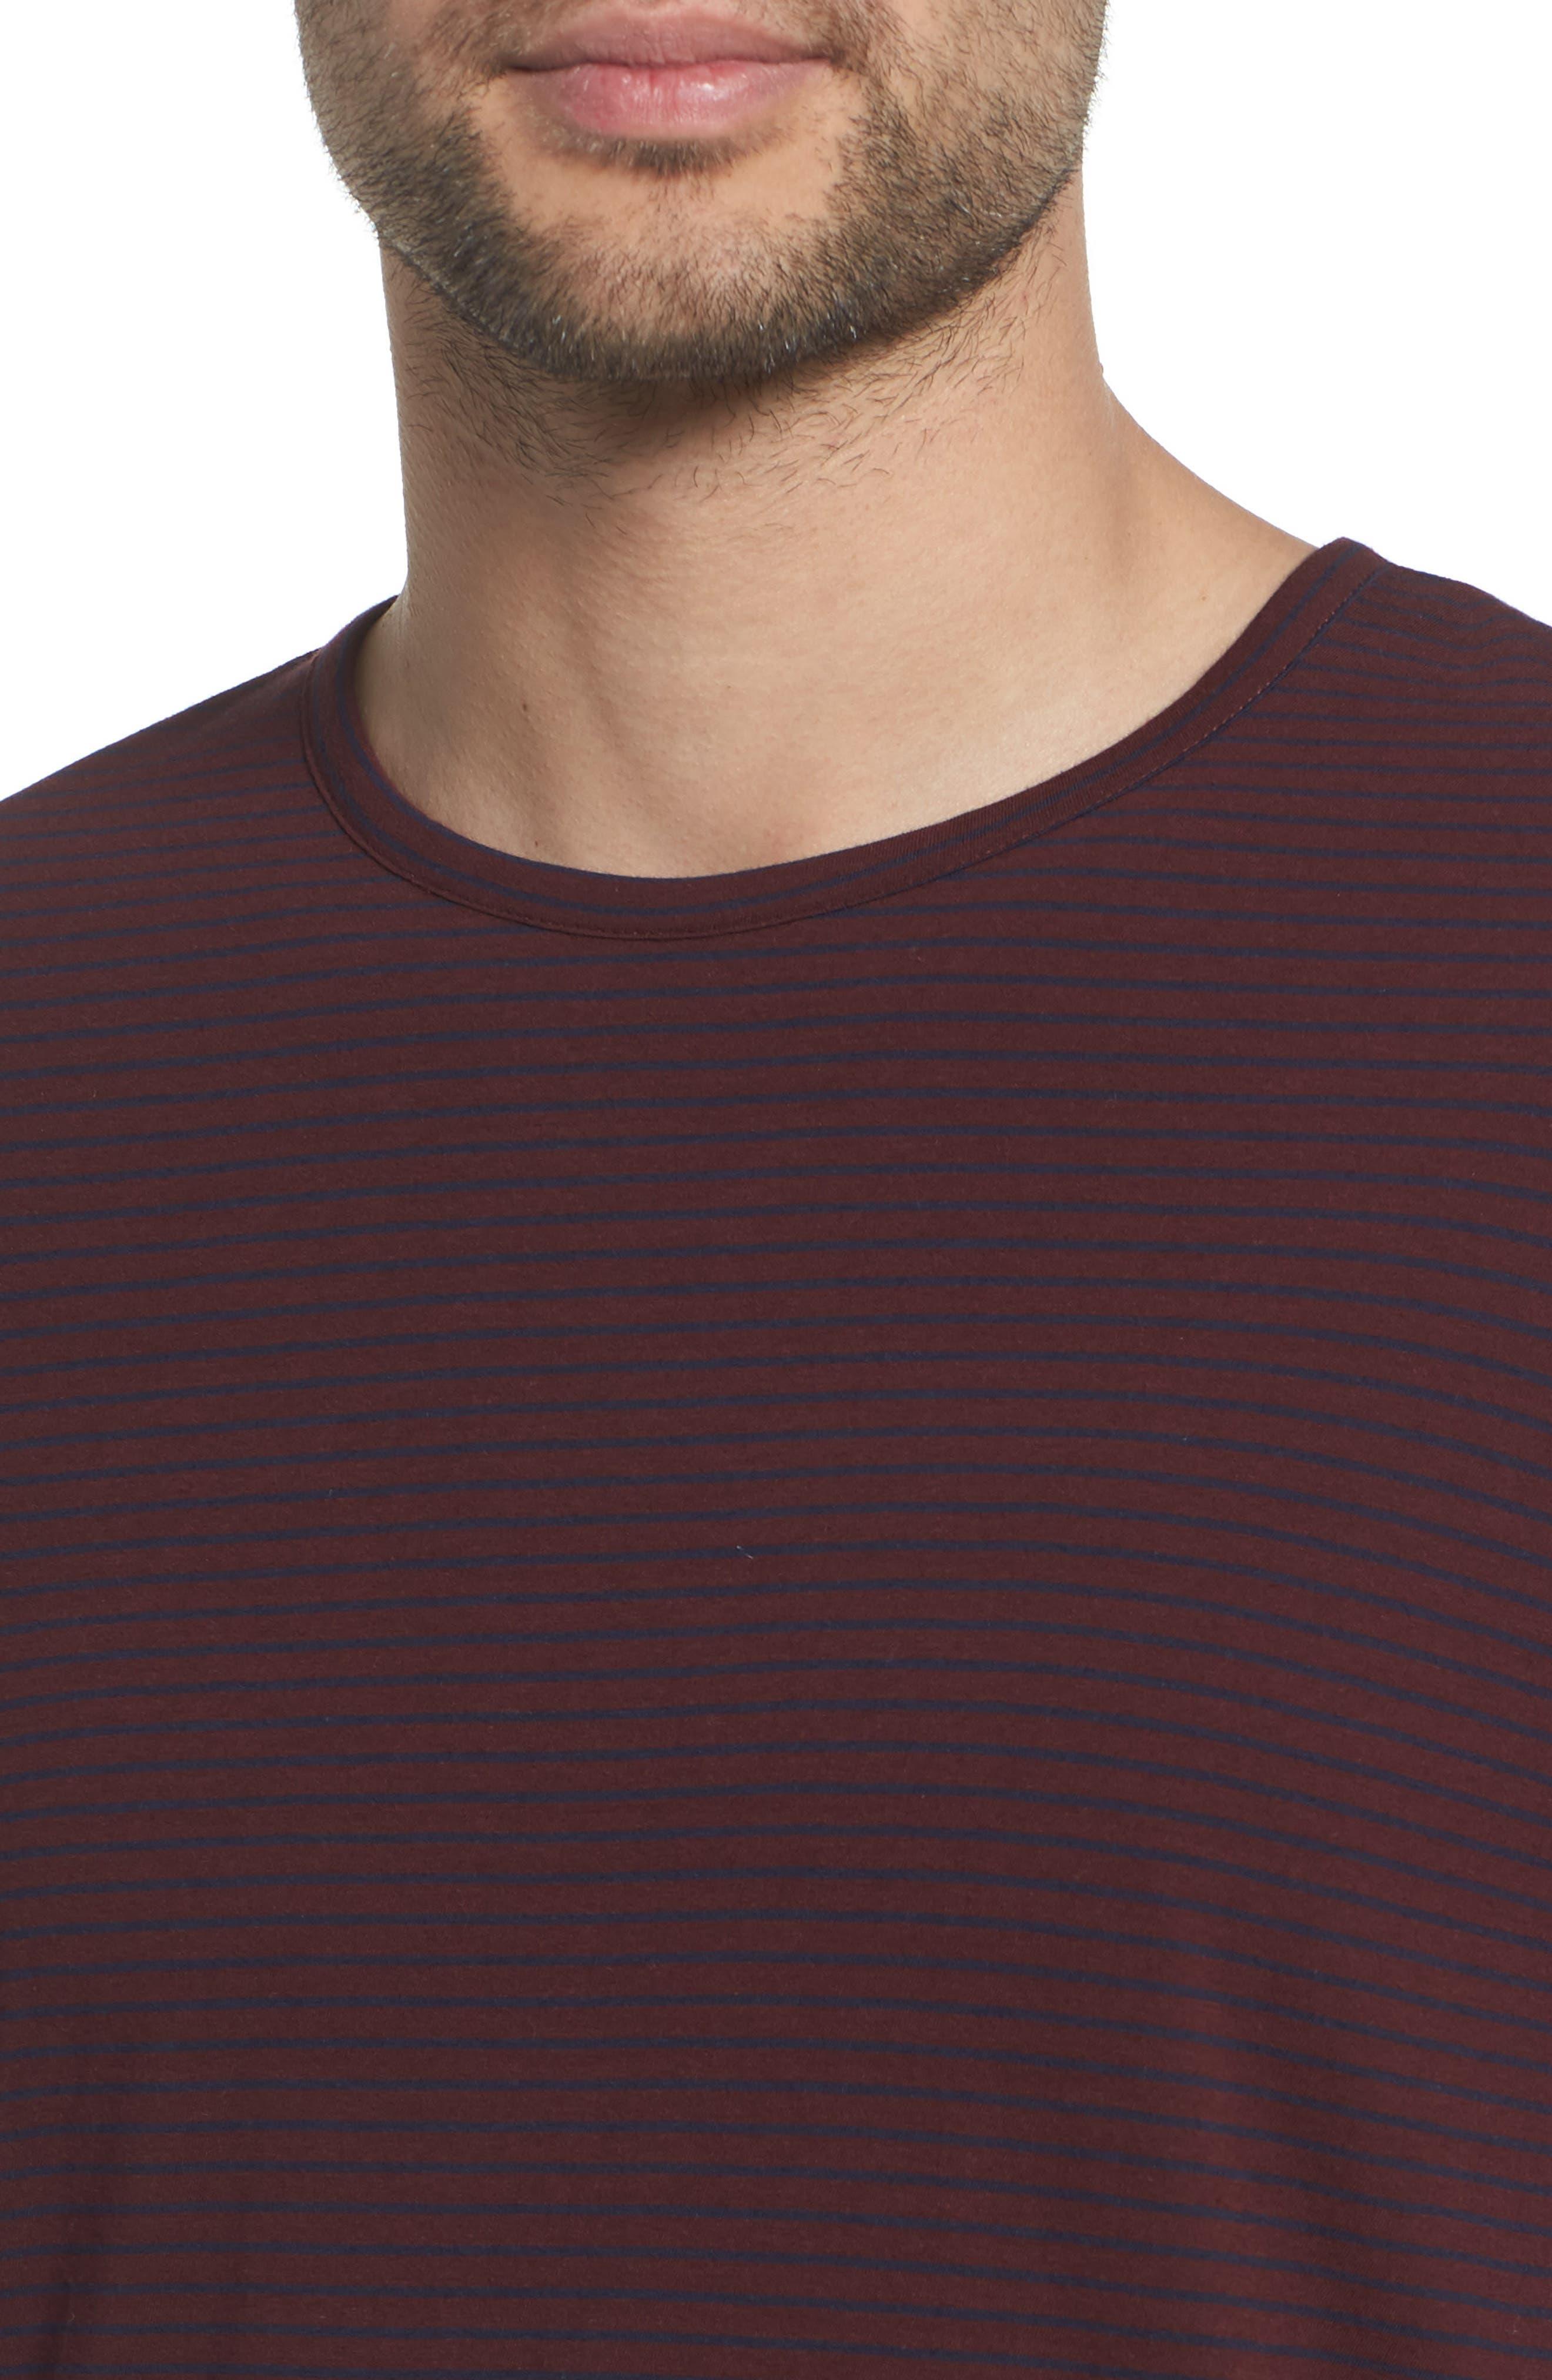 Stripe Long Sleeve Crewneck T-Shirt,                             Alternate thumbnail 4, color,                             Black Cherry/ New Coastal